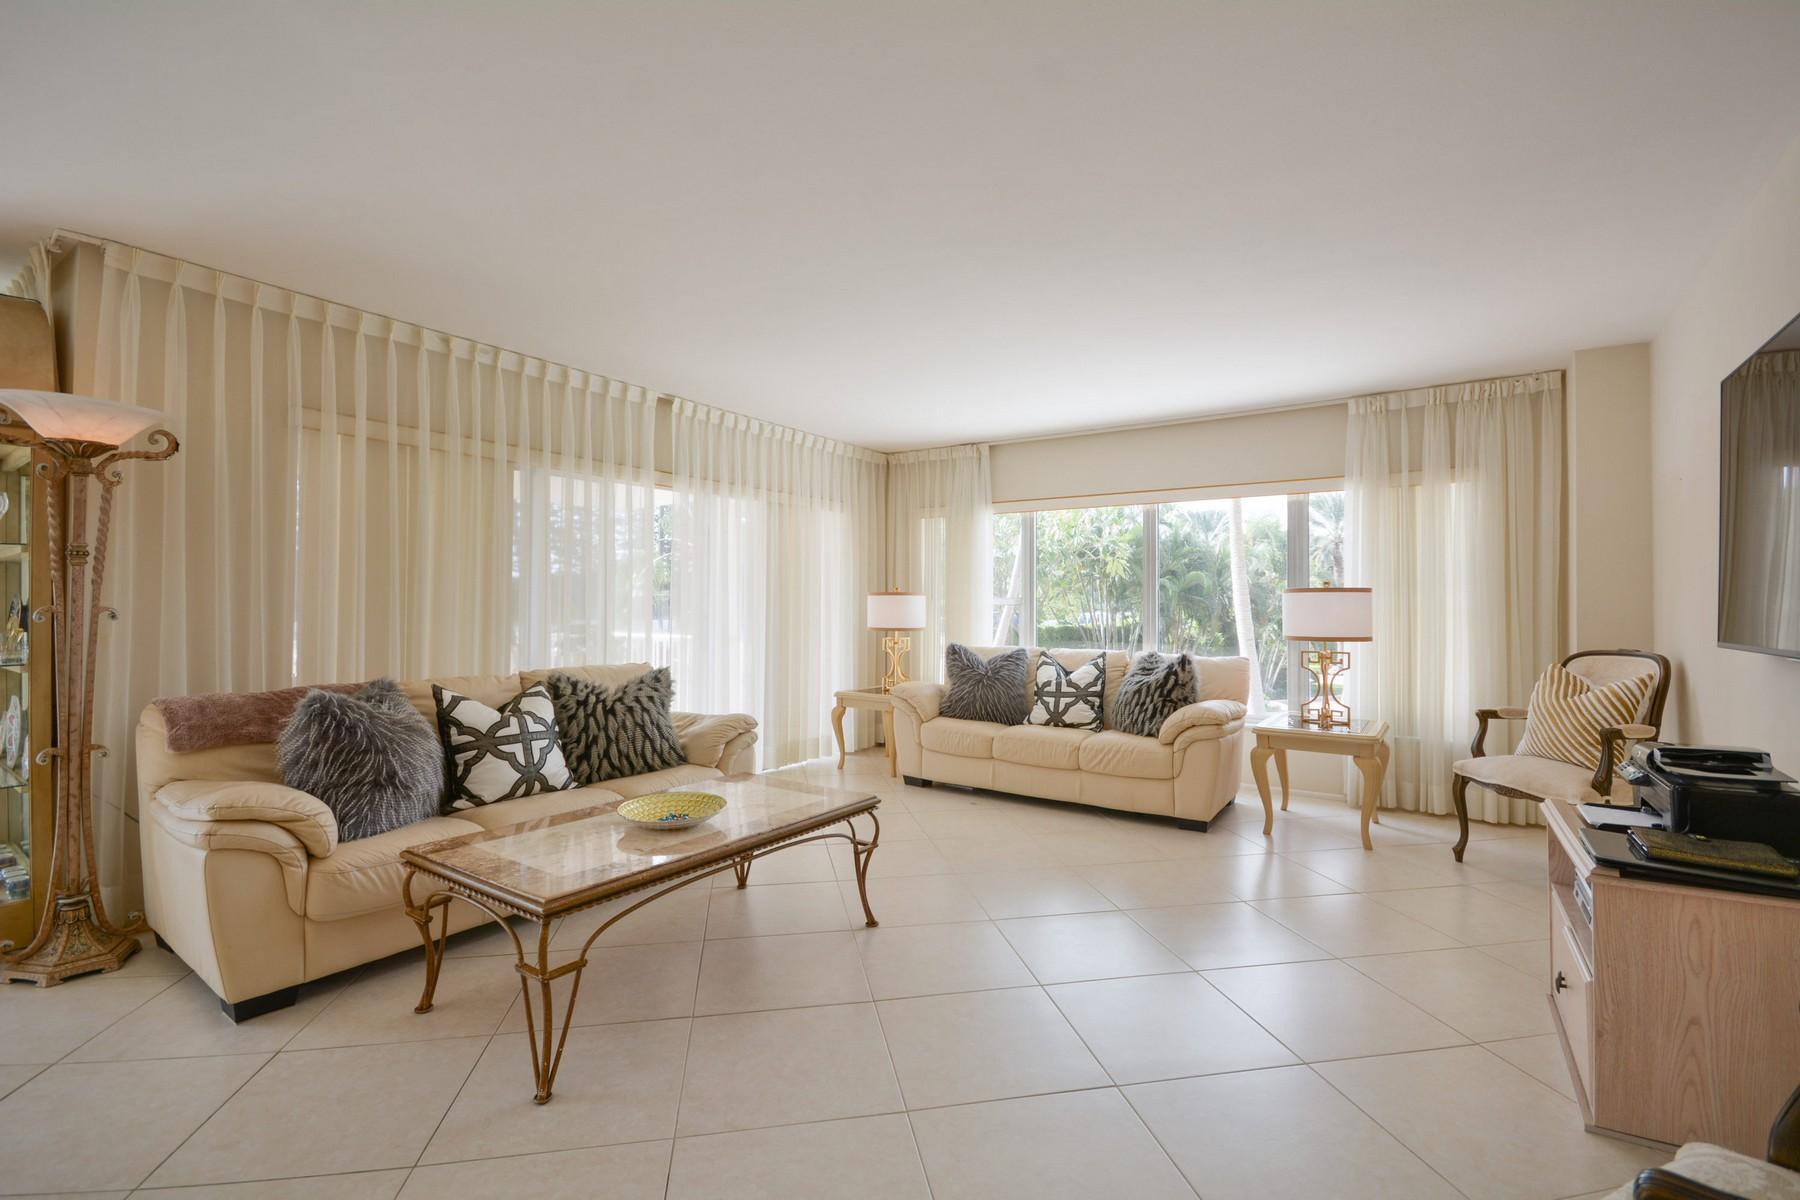 sales property at 875 E Camino Real , Boca Raton, FL 33432